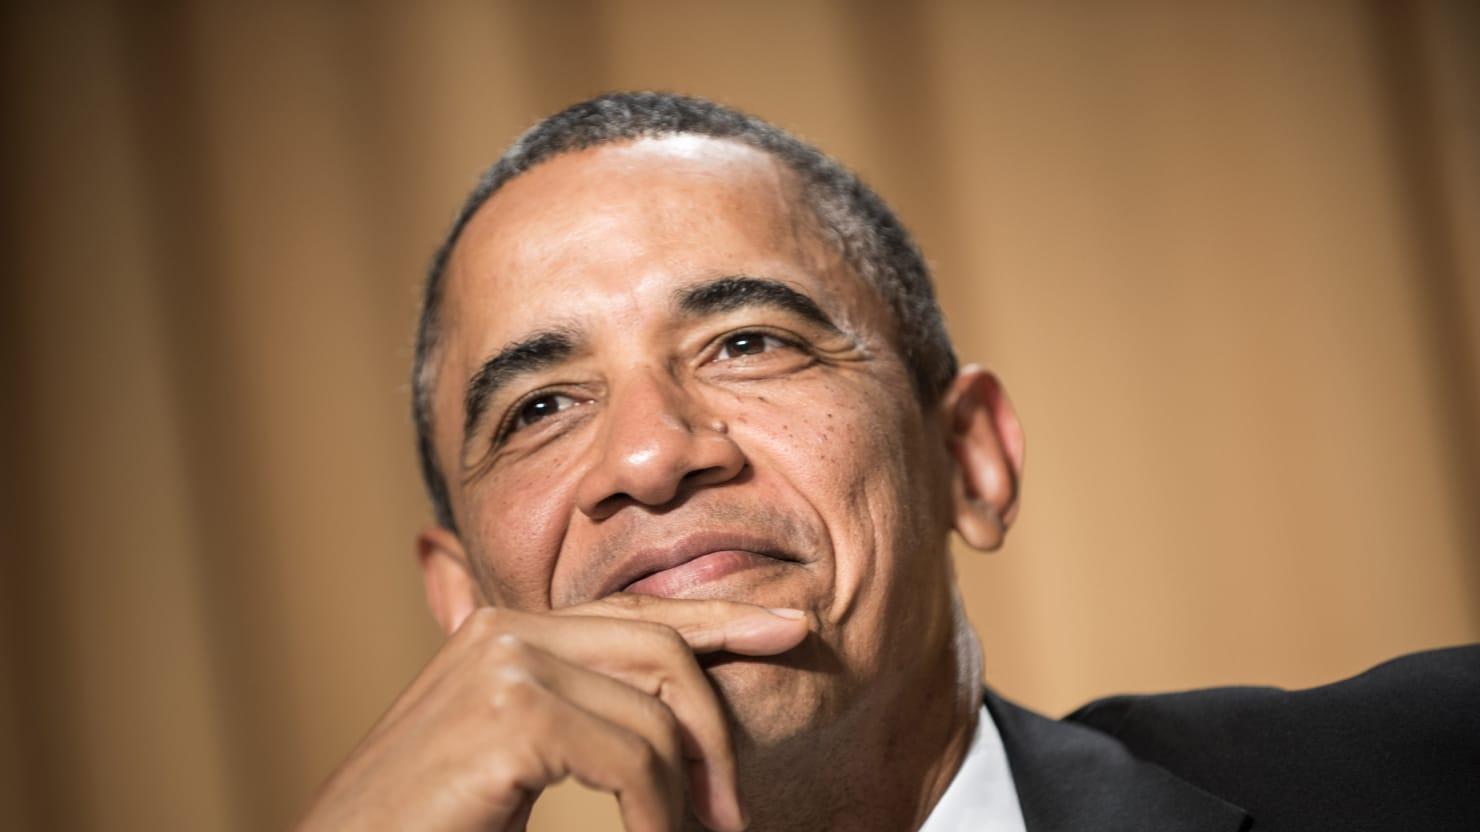 White House Correspondents' Dinner: Obama Nails It, Again